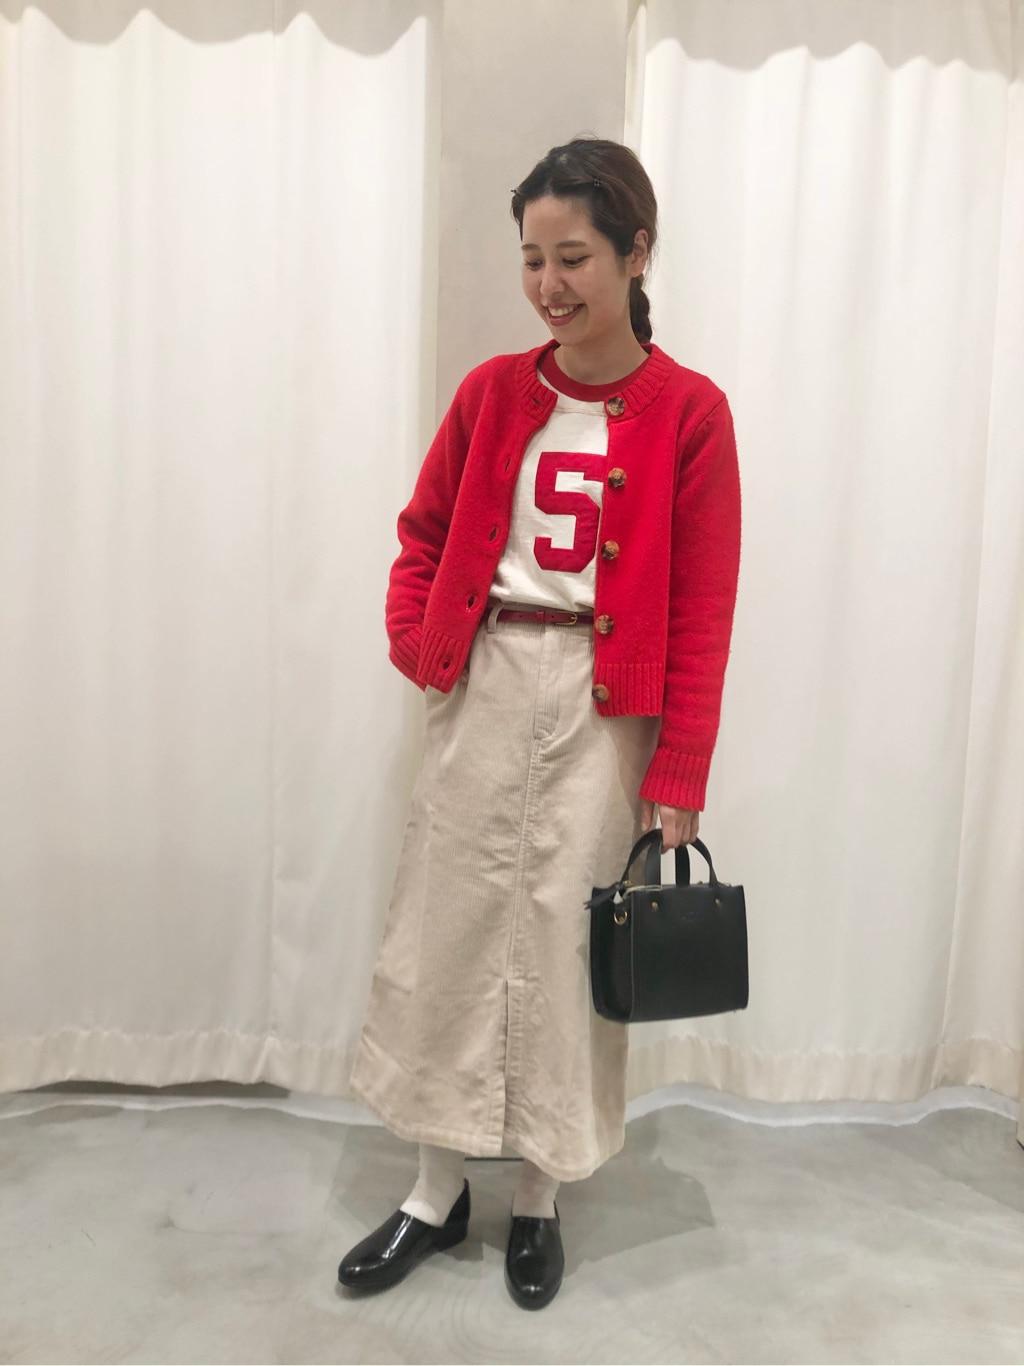 - CHILD WOMAN CHILD WOMAN , PAR ICI 東京スカイツリータウン・ソラマチ 身長:160cm 2020.12.16